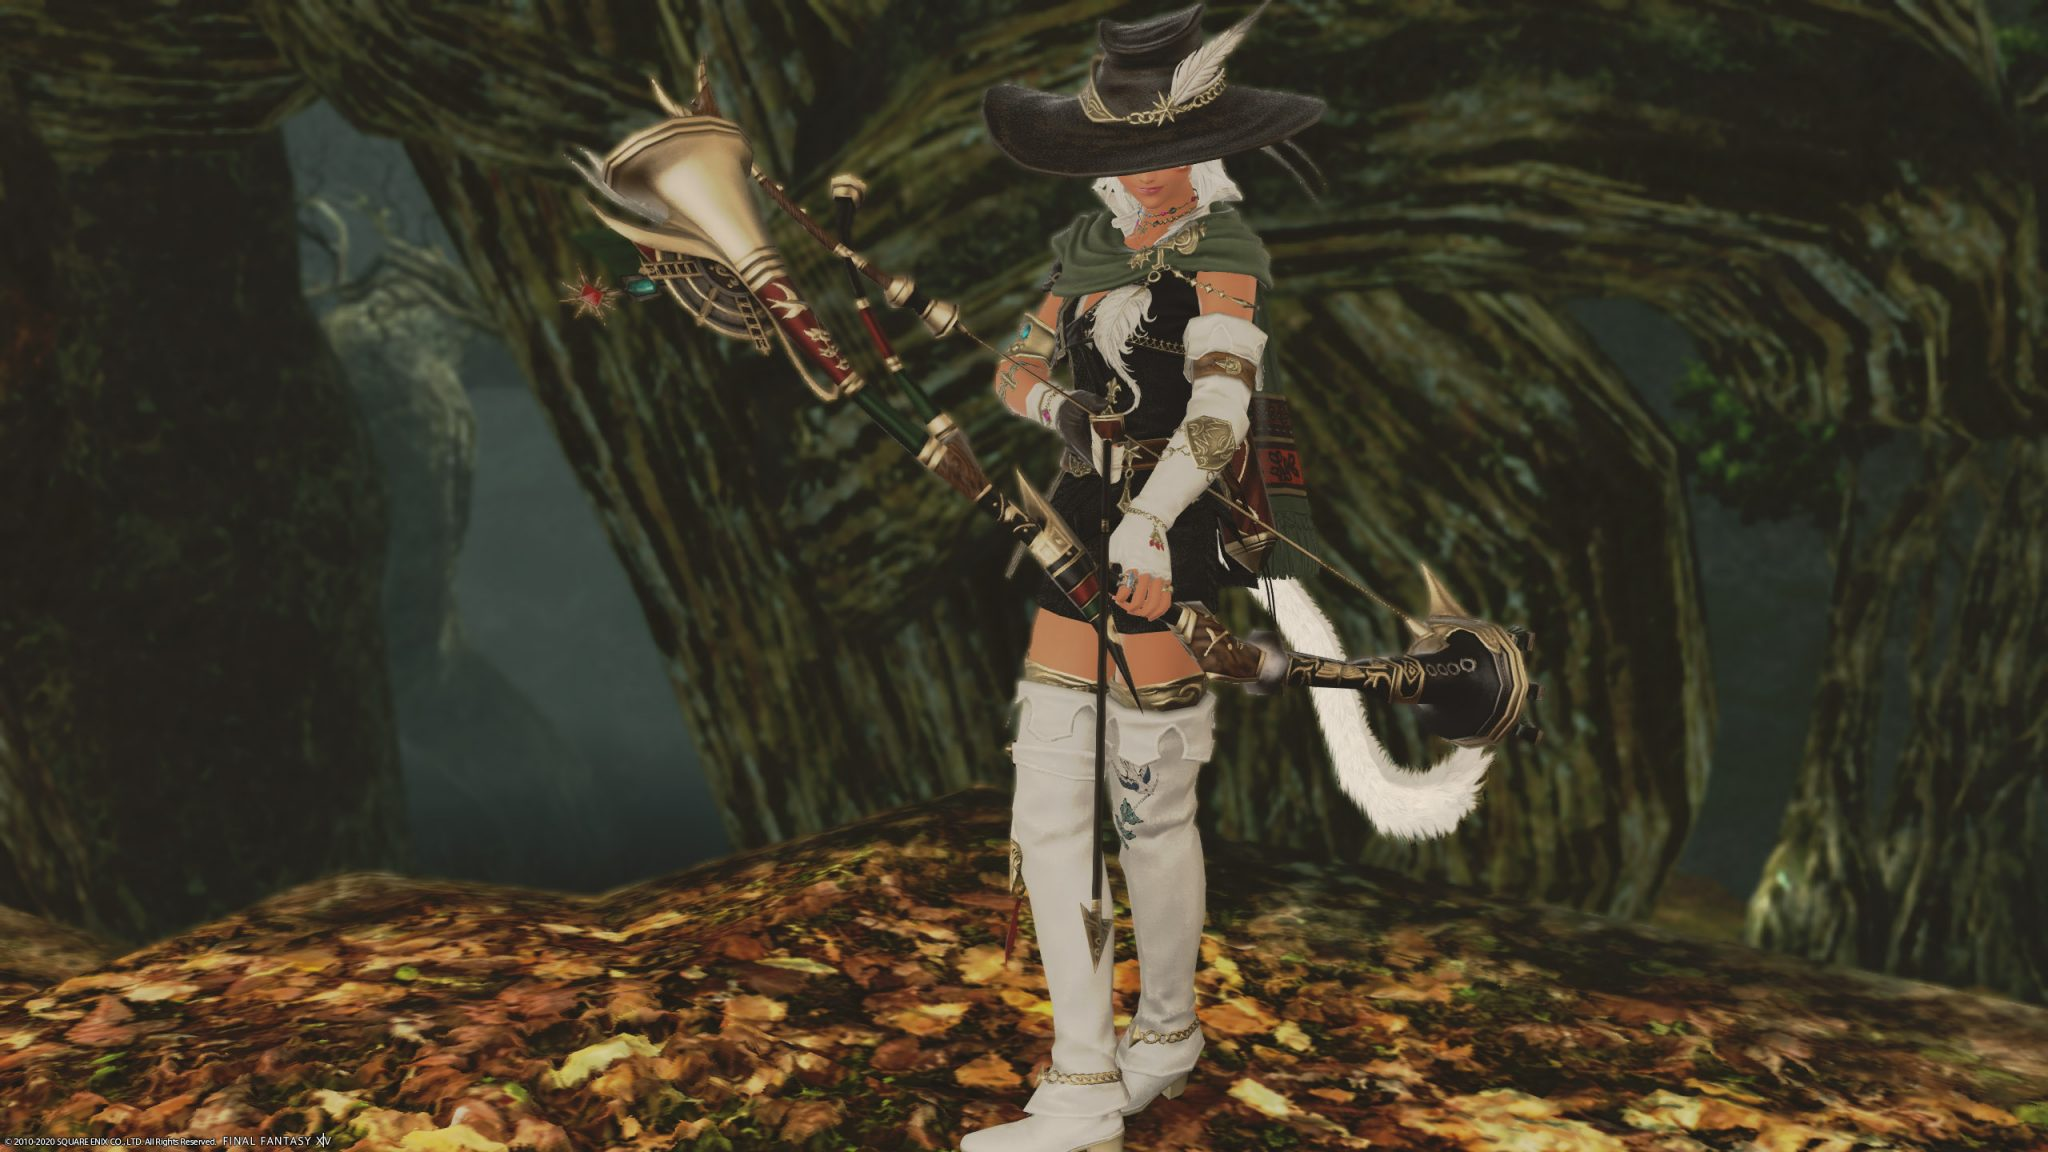 Final Fantasy X Rustung 4 Freie Slots